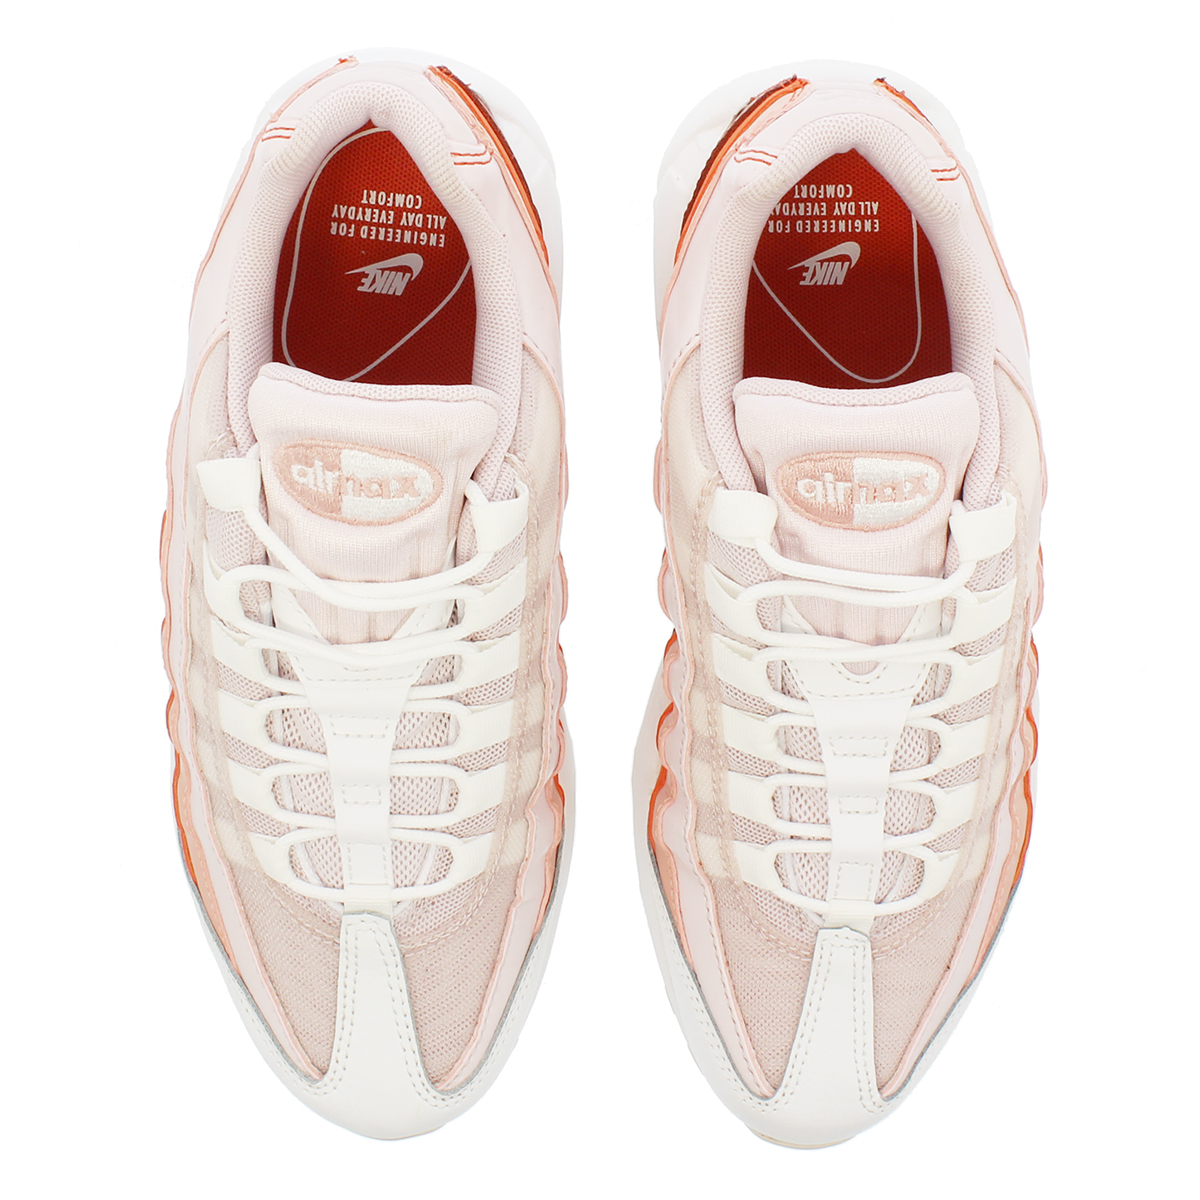 new product 9302a 5594b NIKE WMNS AIR MAX 95 Nike women Air Max 95 BAREY ROSE CORAL STARDUST 307960- 604-l